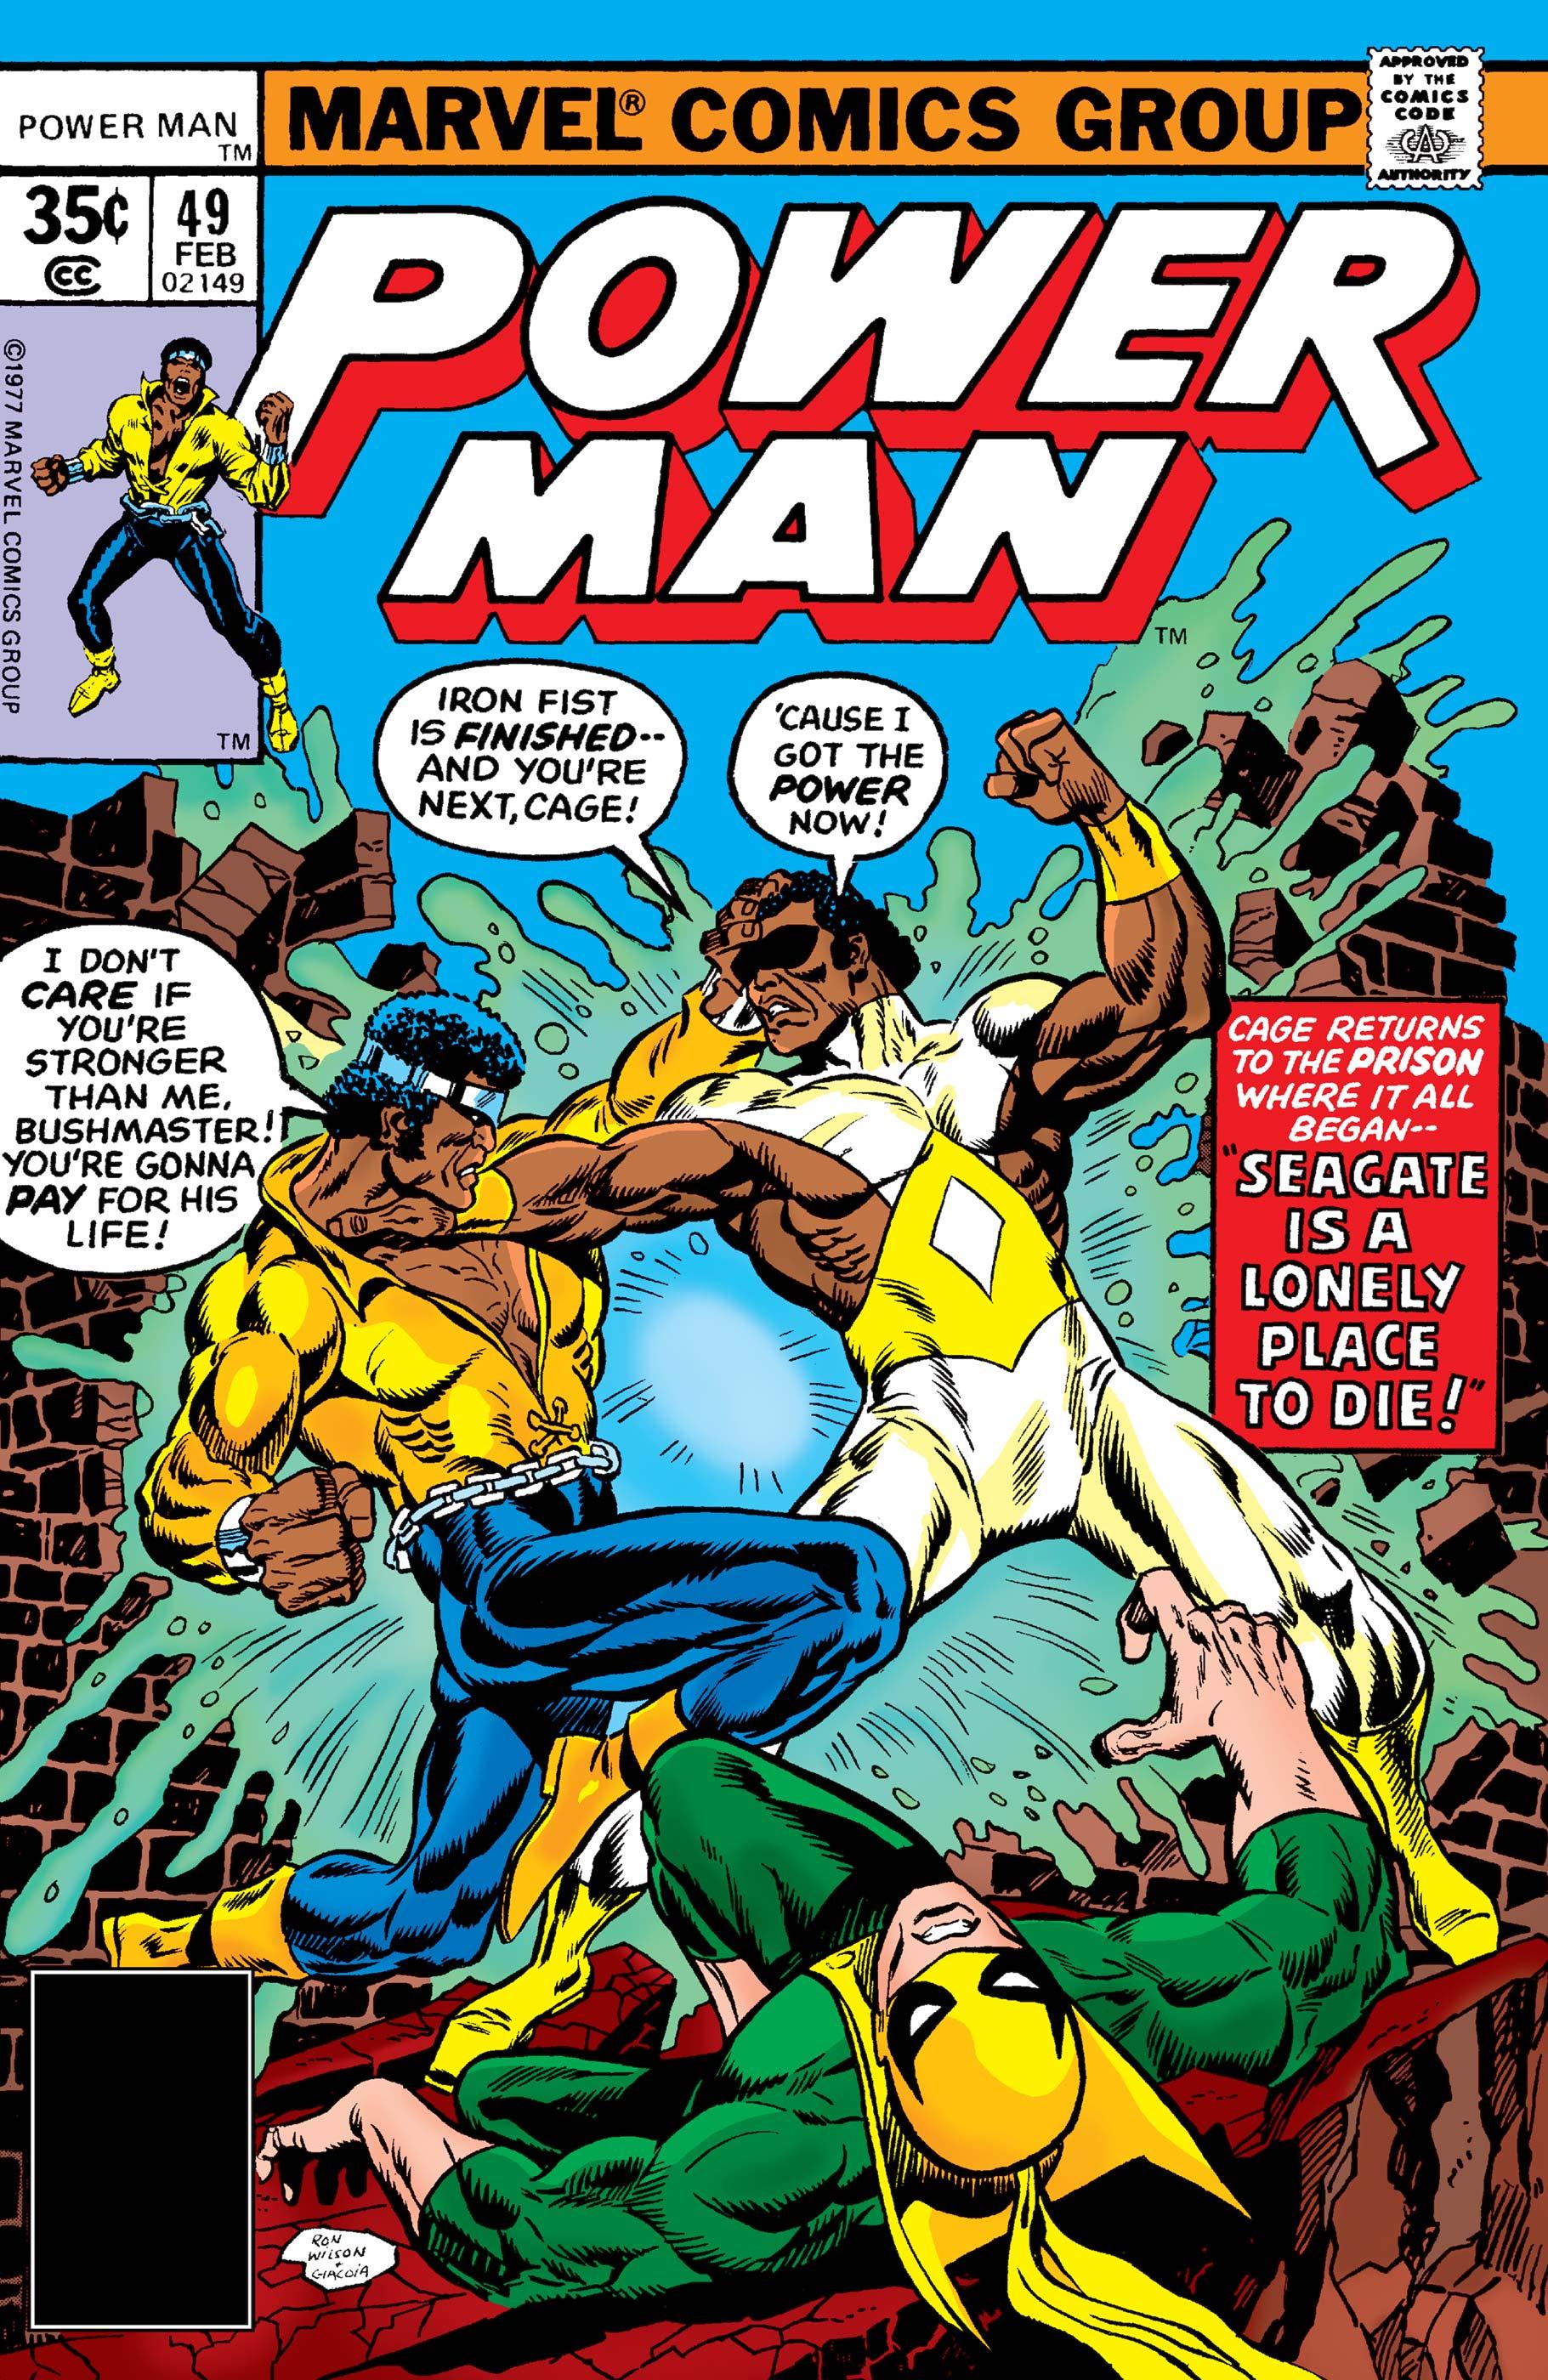 Power Man (1974) #49